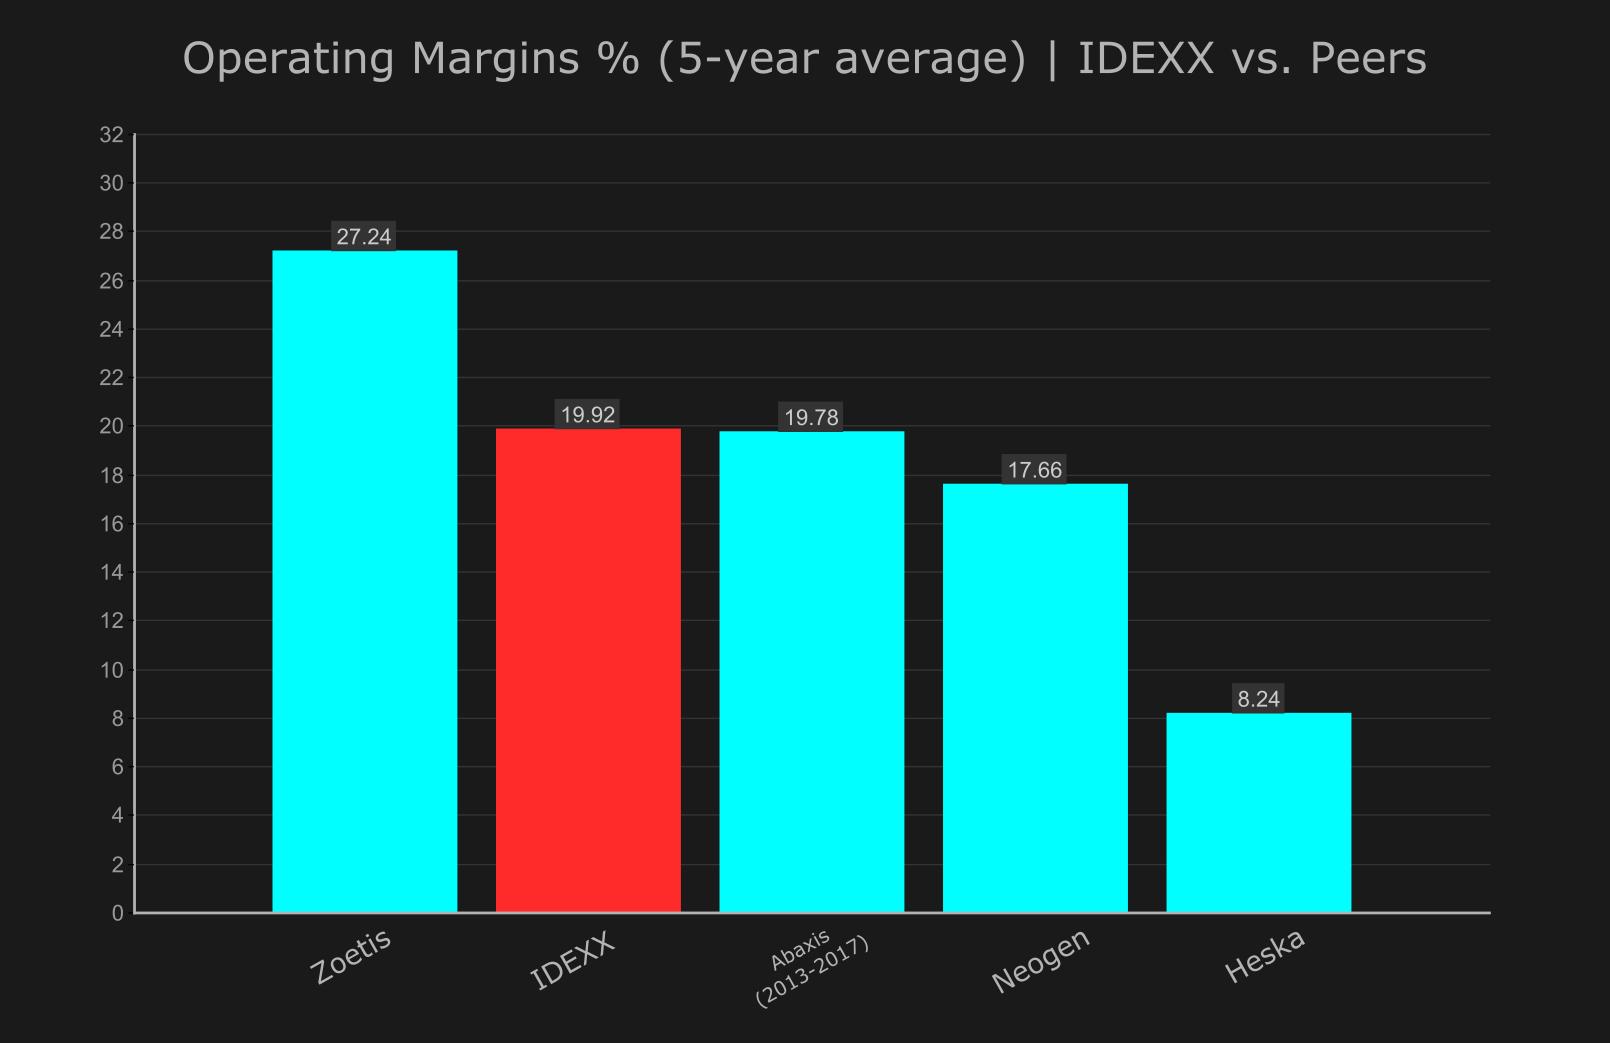 IDEXX: A Different Kind Of Animal - IDEXX Laboratories, Inc